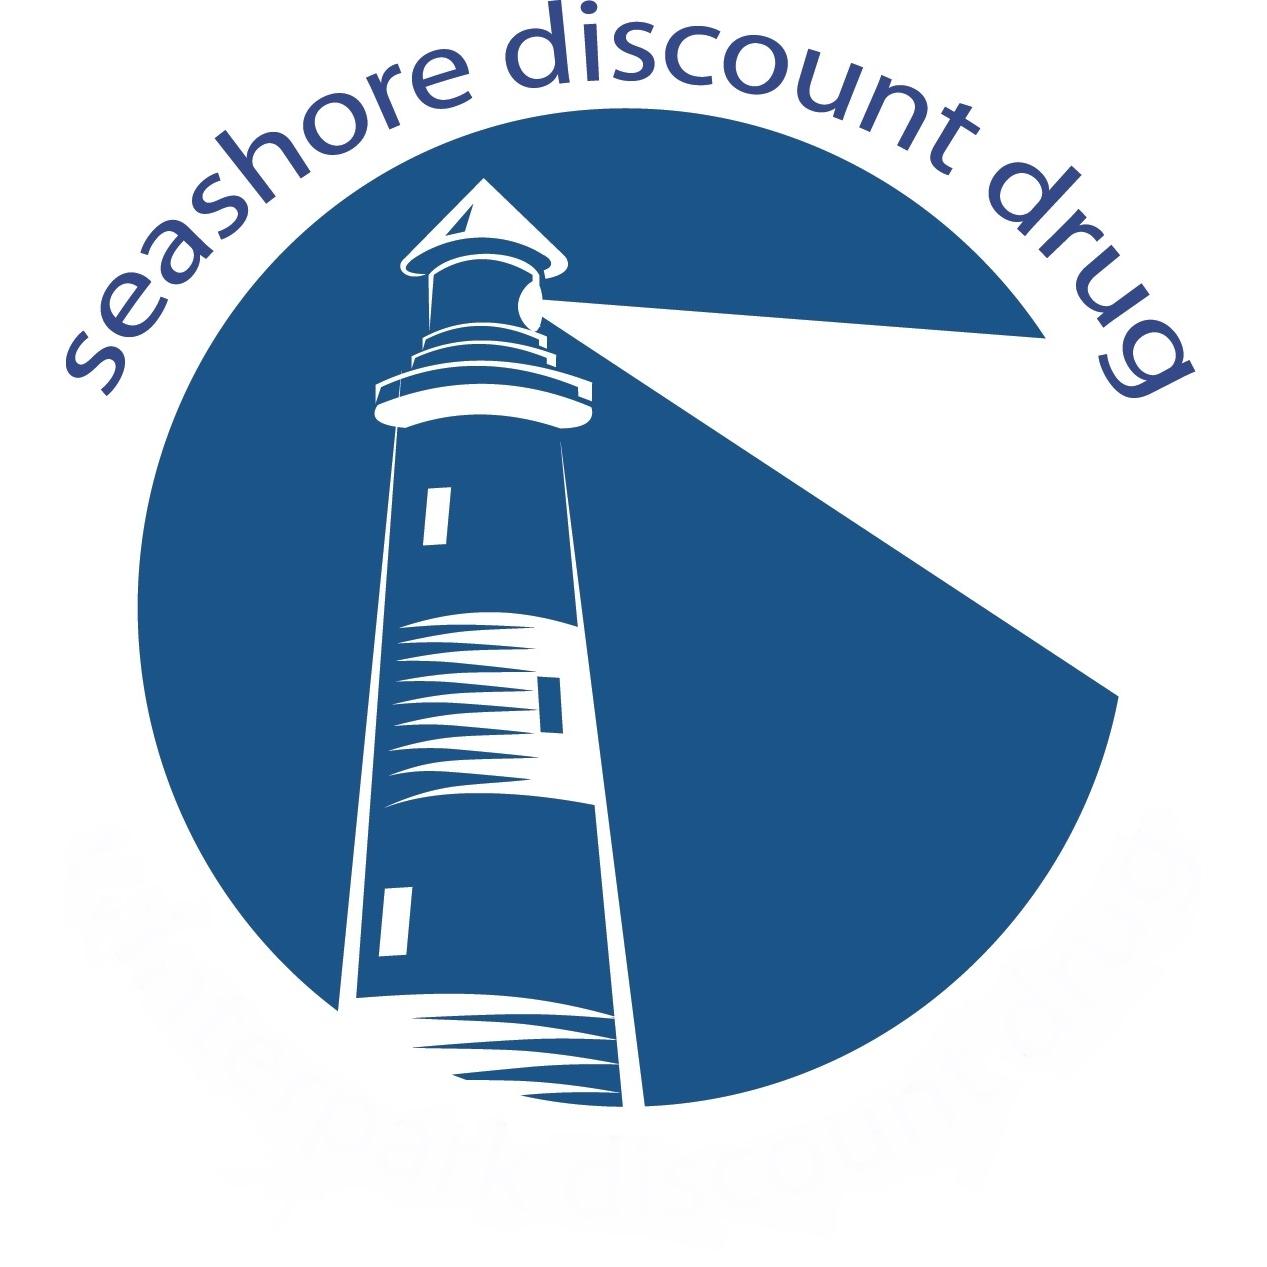 Seashore Drugs, Inc. - Wilmington, NC - Home Health Care Services